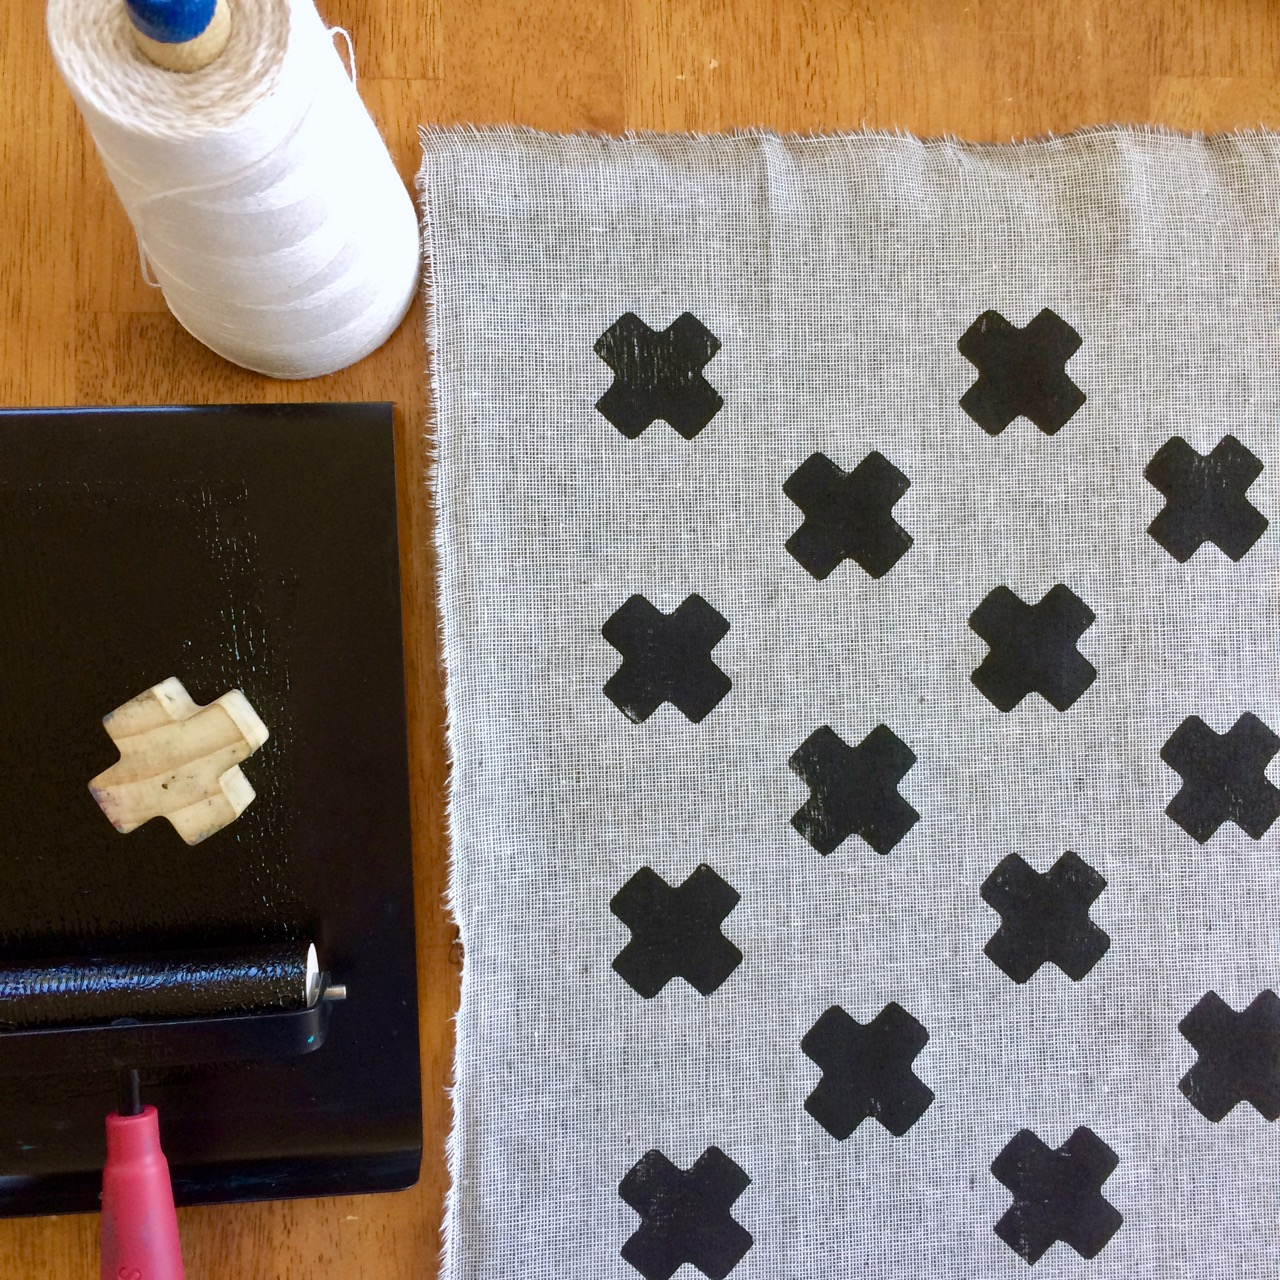 fabricblockprintinghowto.jpg